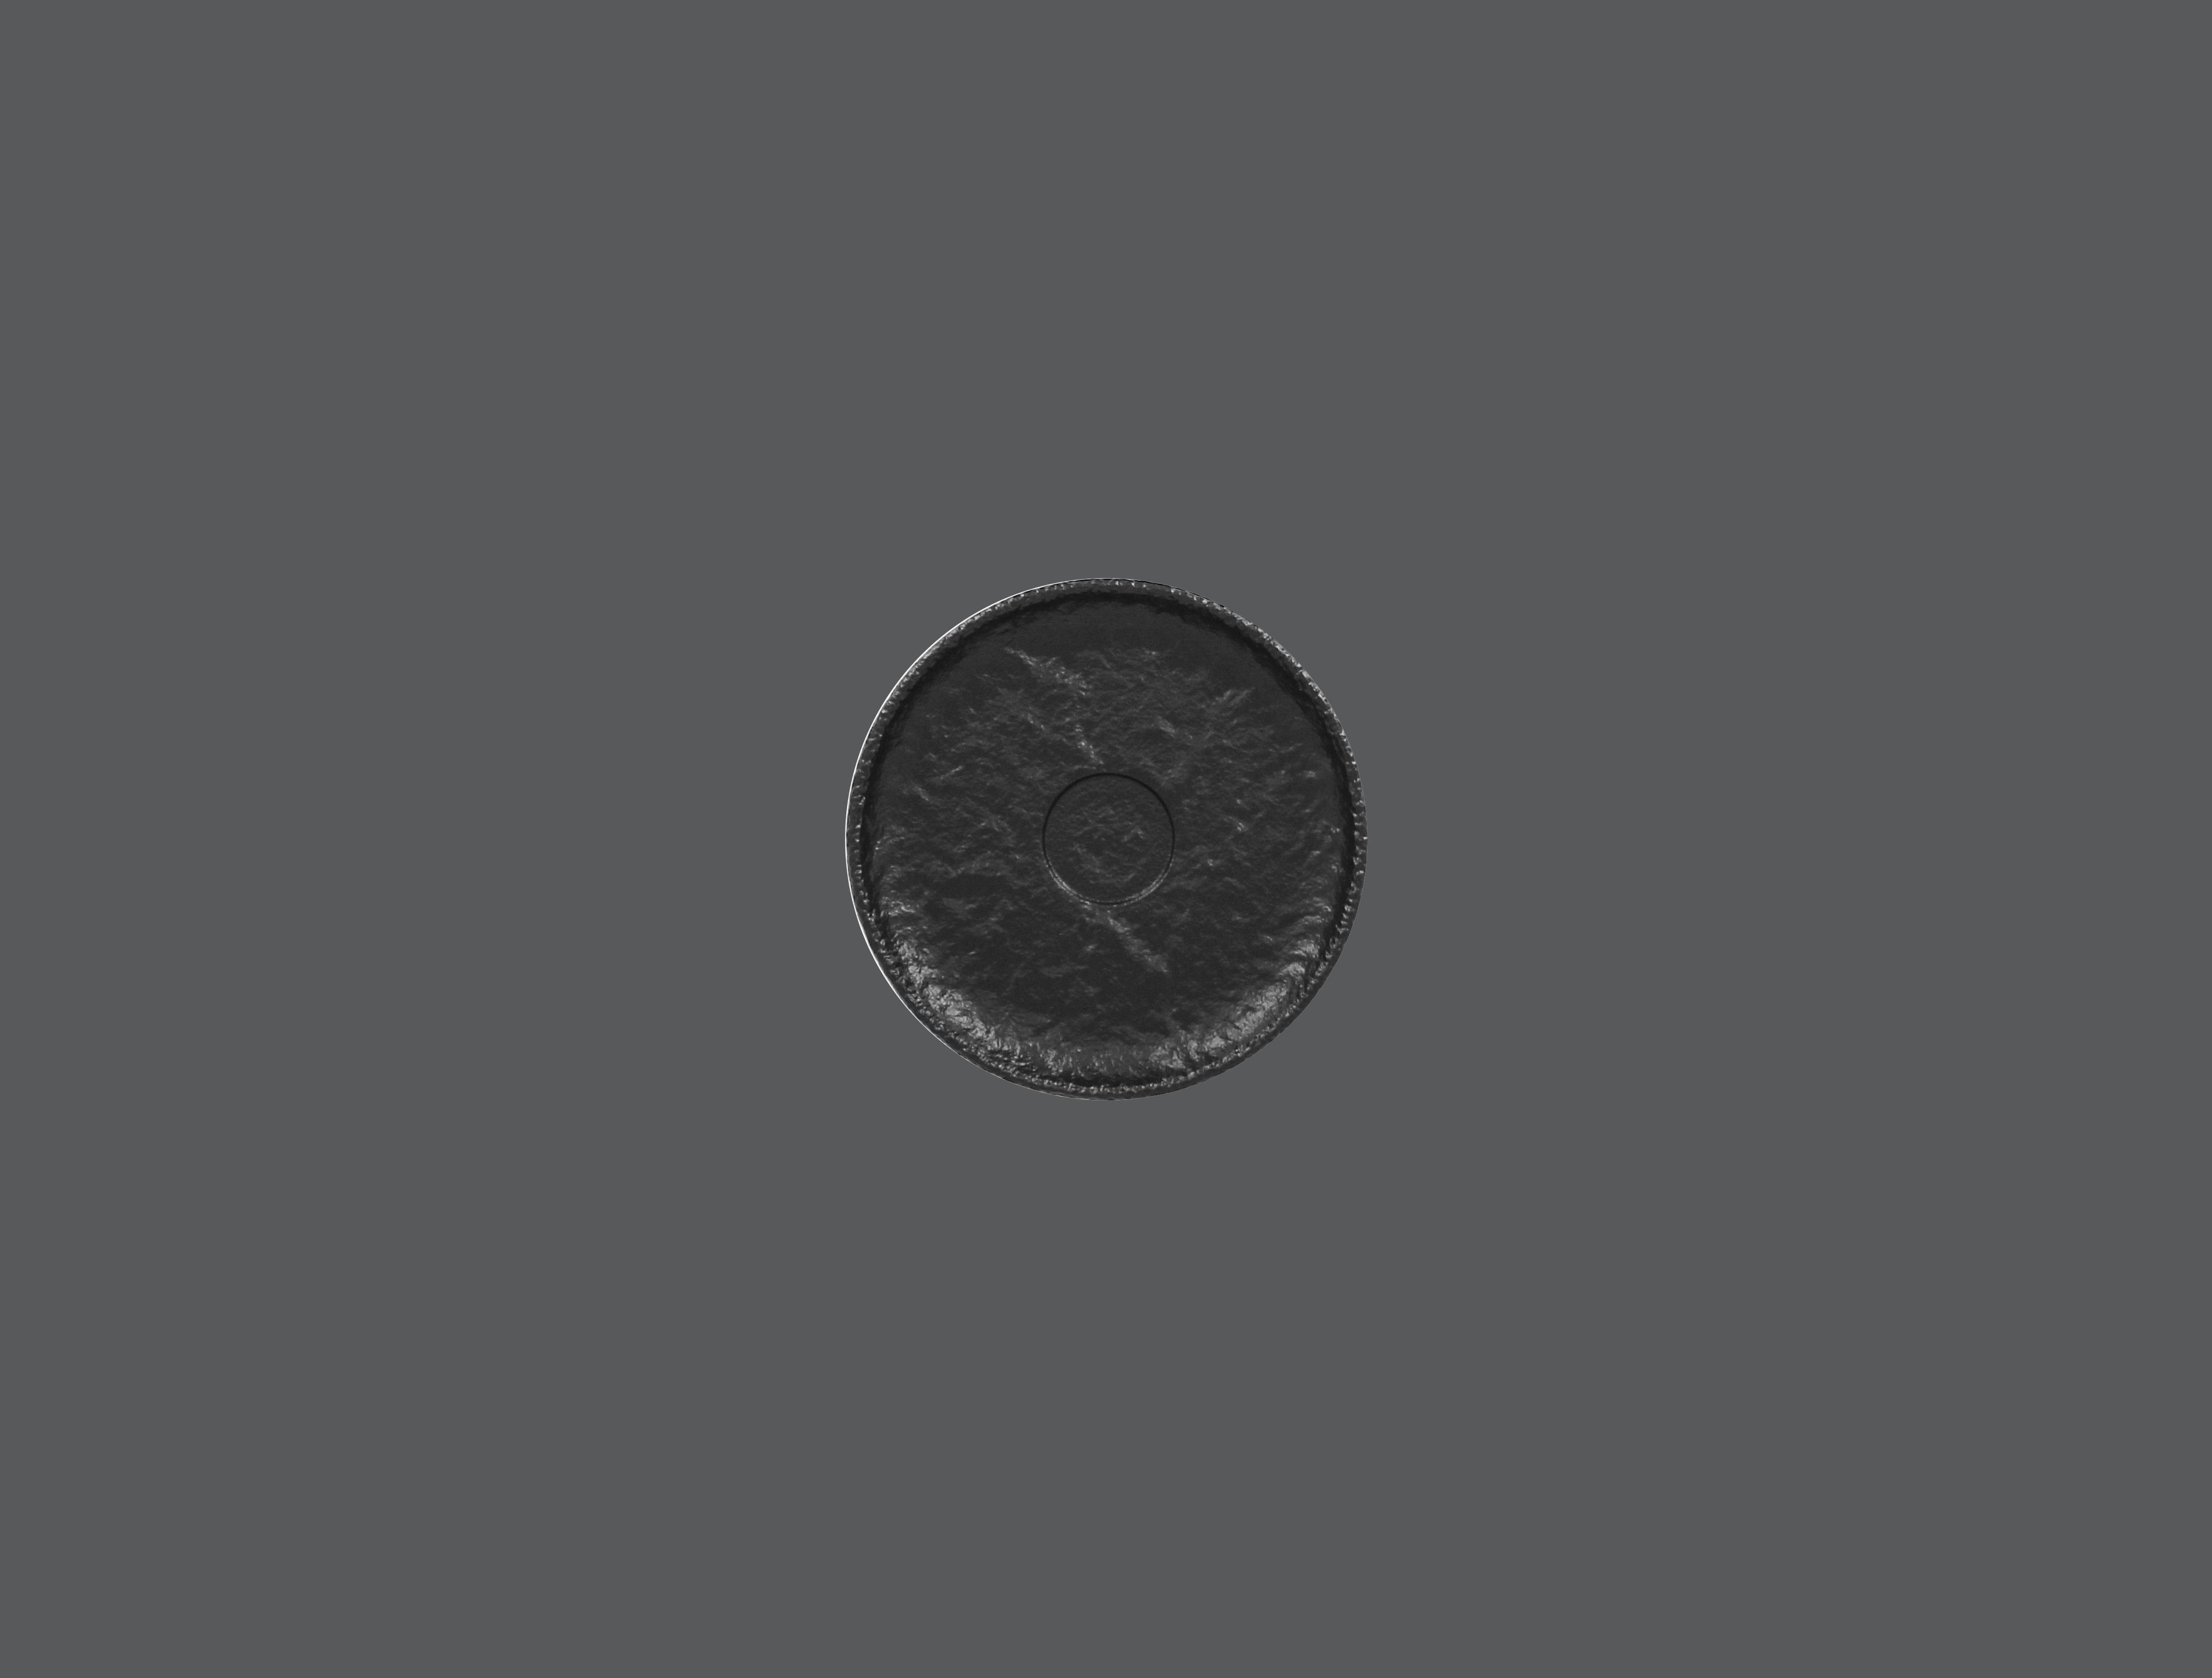 Podšálek kulatý pro RKCU09 - 13 cm